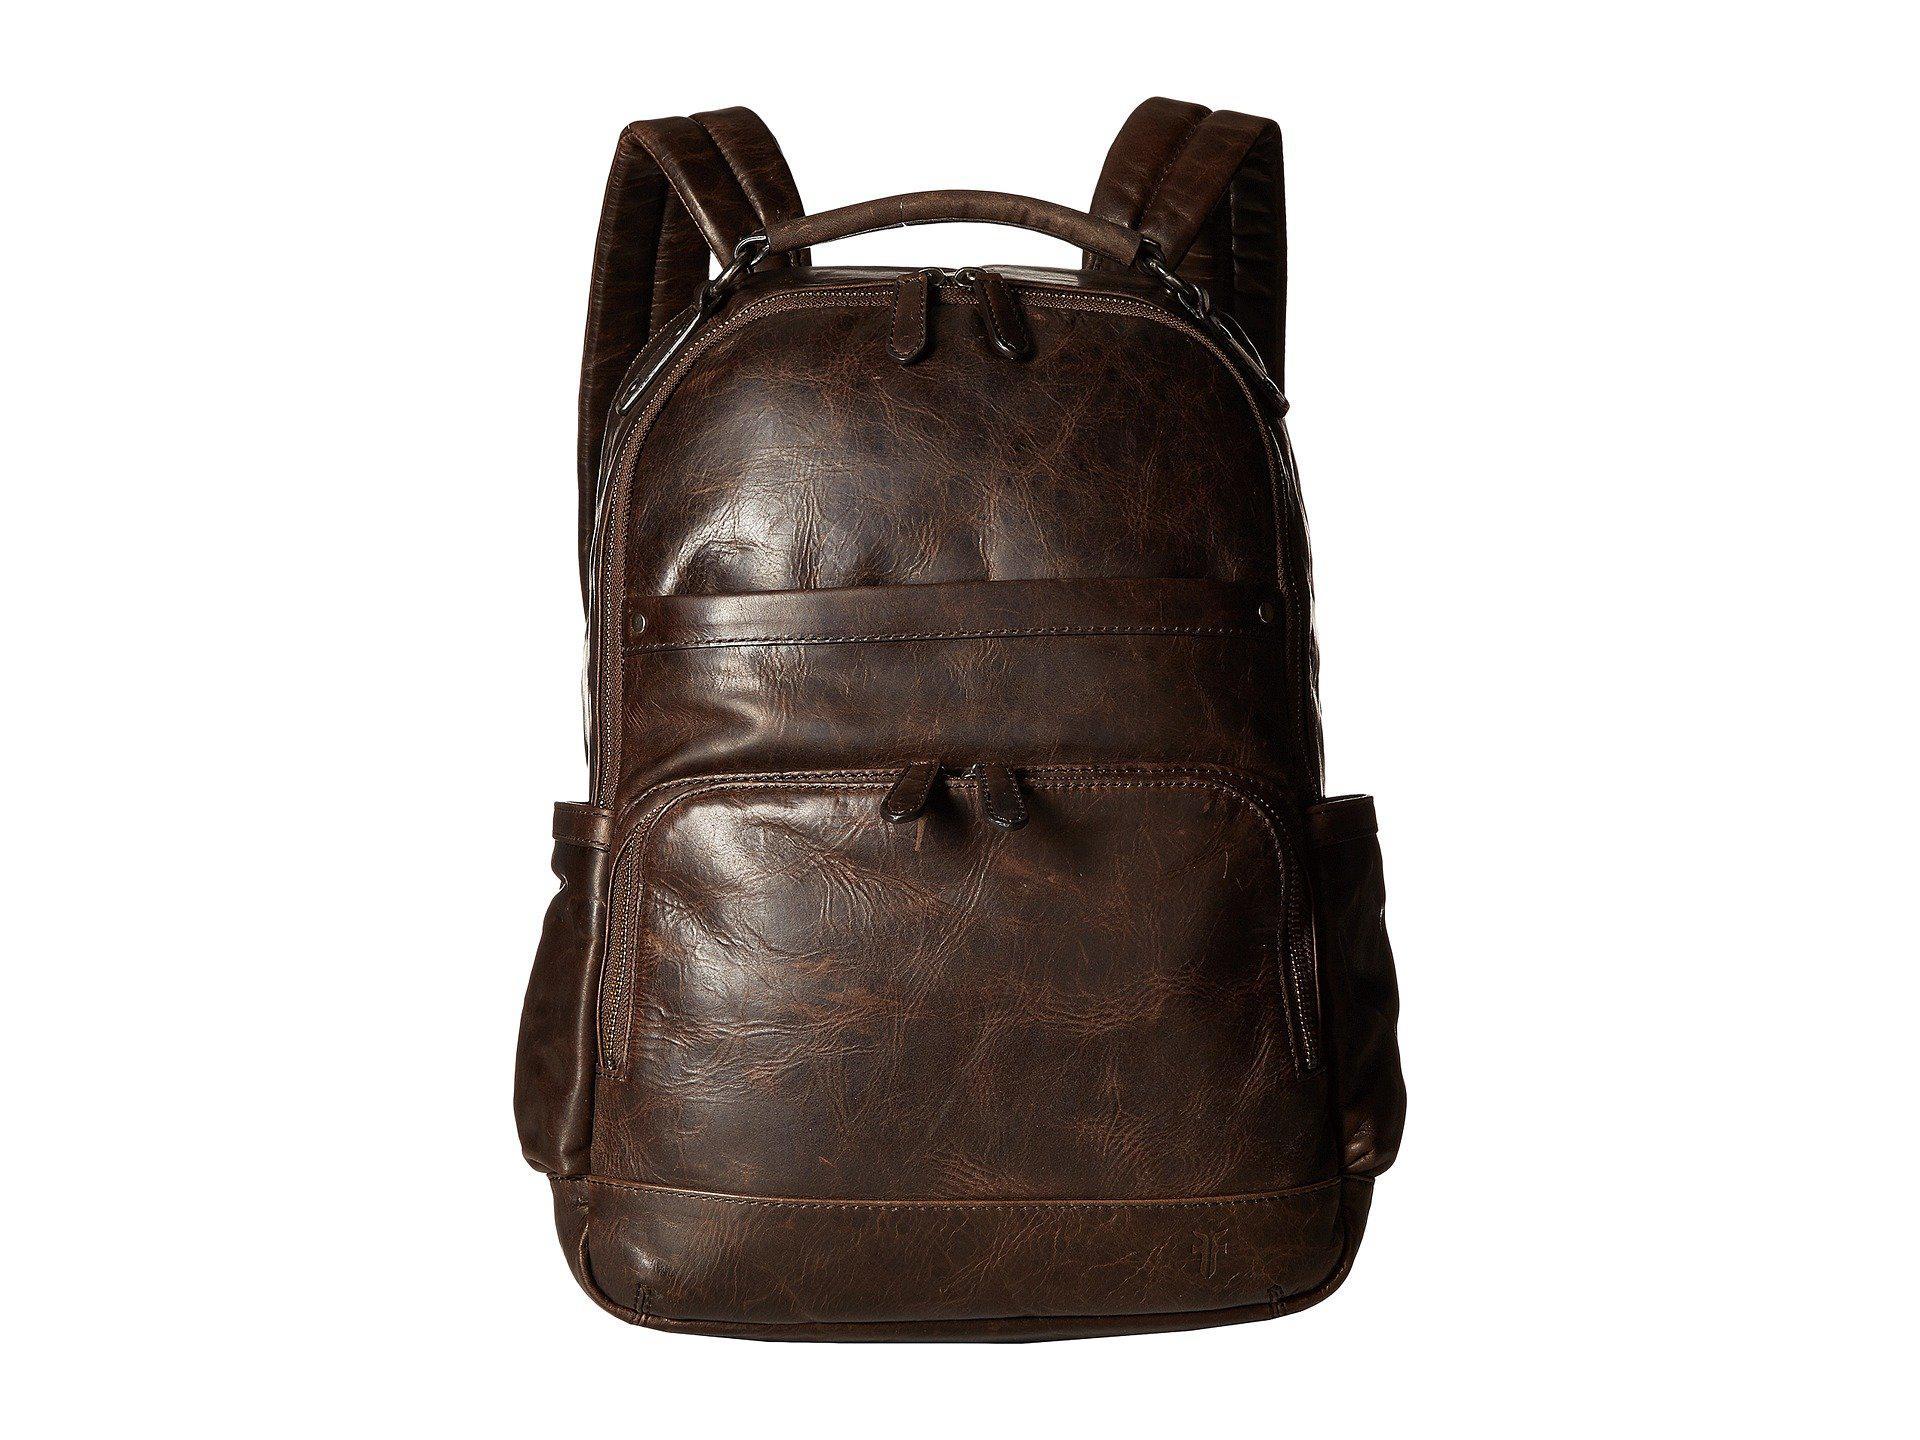 6f033752b64f Frye - Brown Logan Backpack (slate) Backpack Bags for Men - Lyst. View  fullscreen